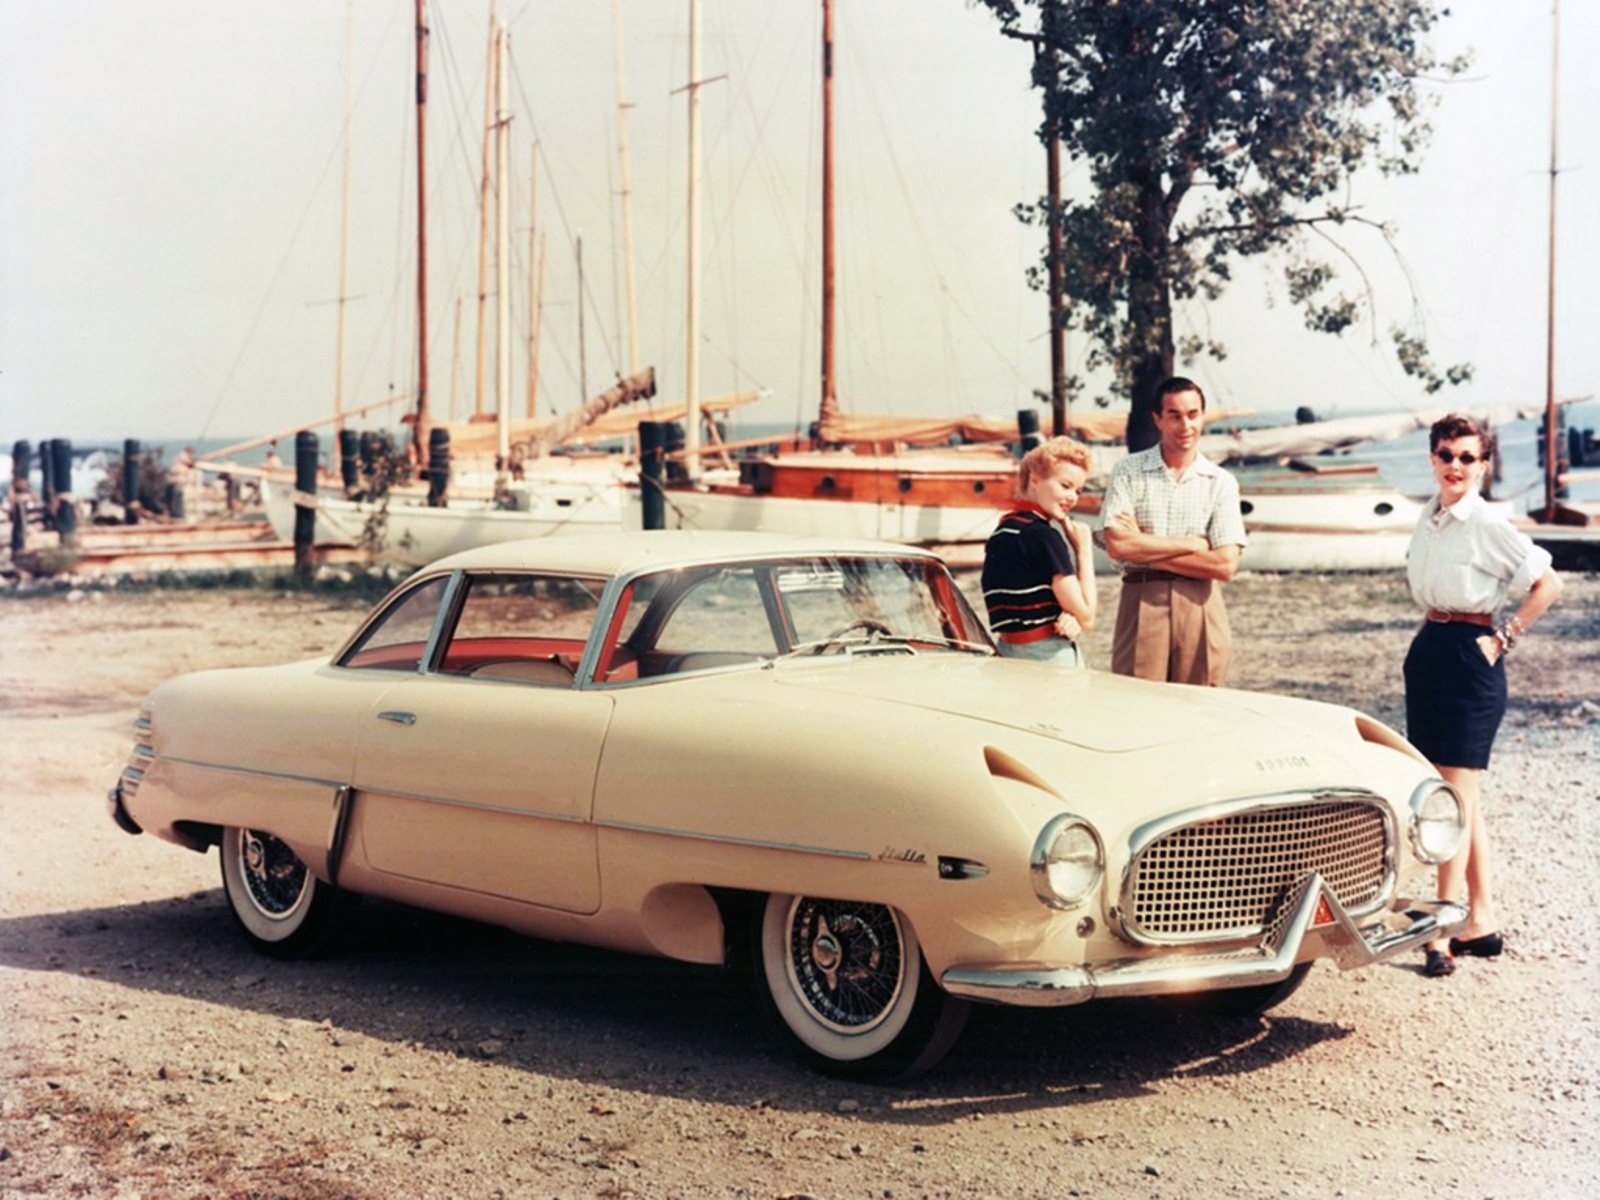 http://carpedia.altervista.org/albums/Hudson/_1954__Hudson_Italia.jpg